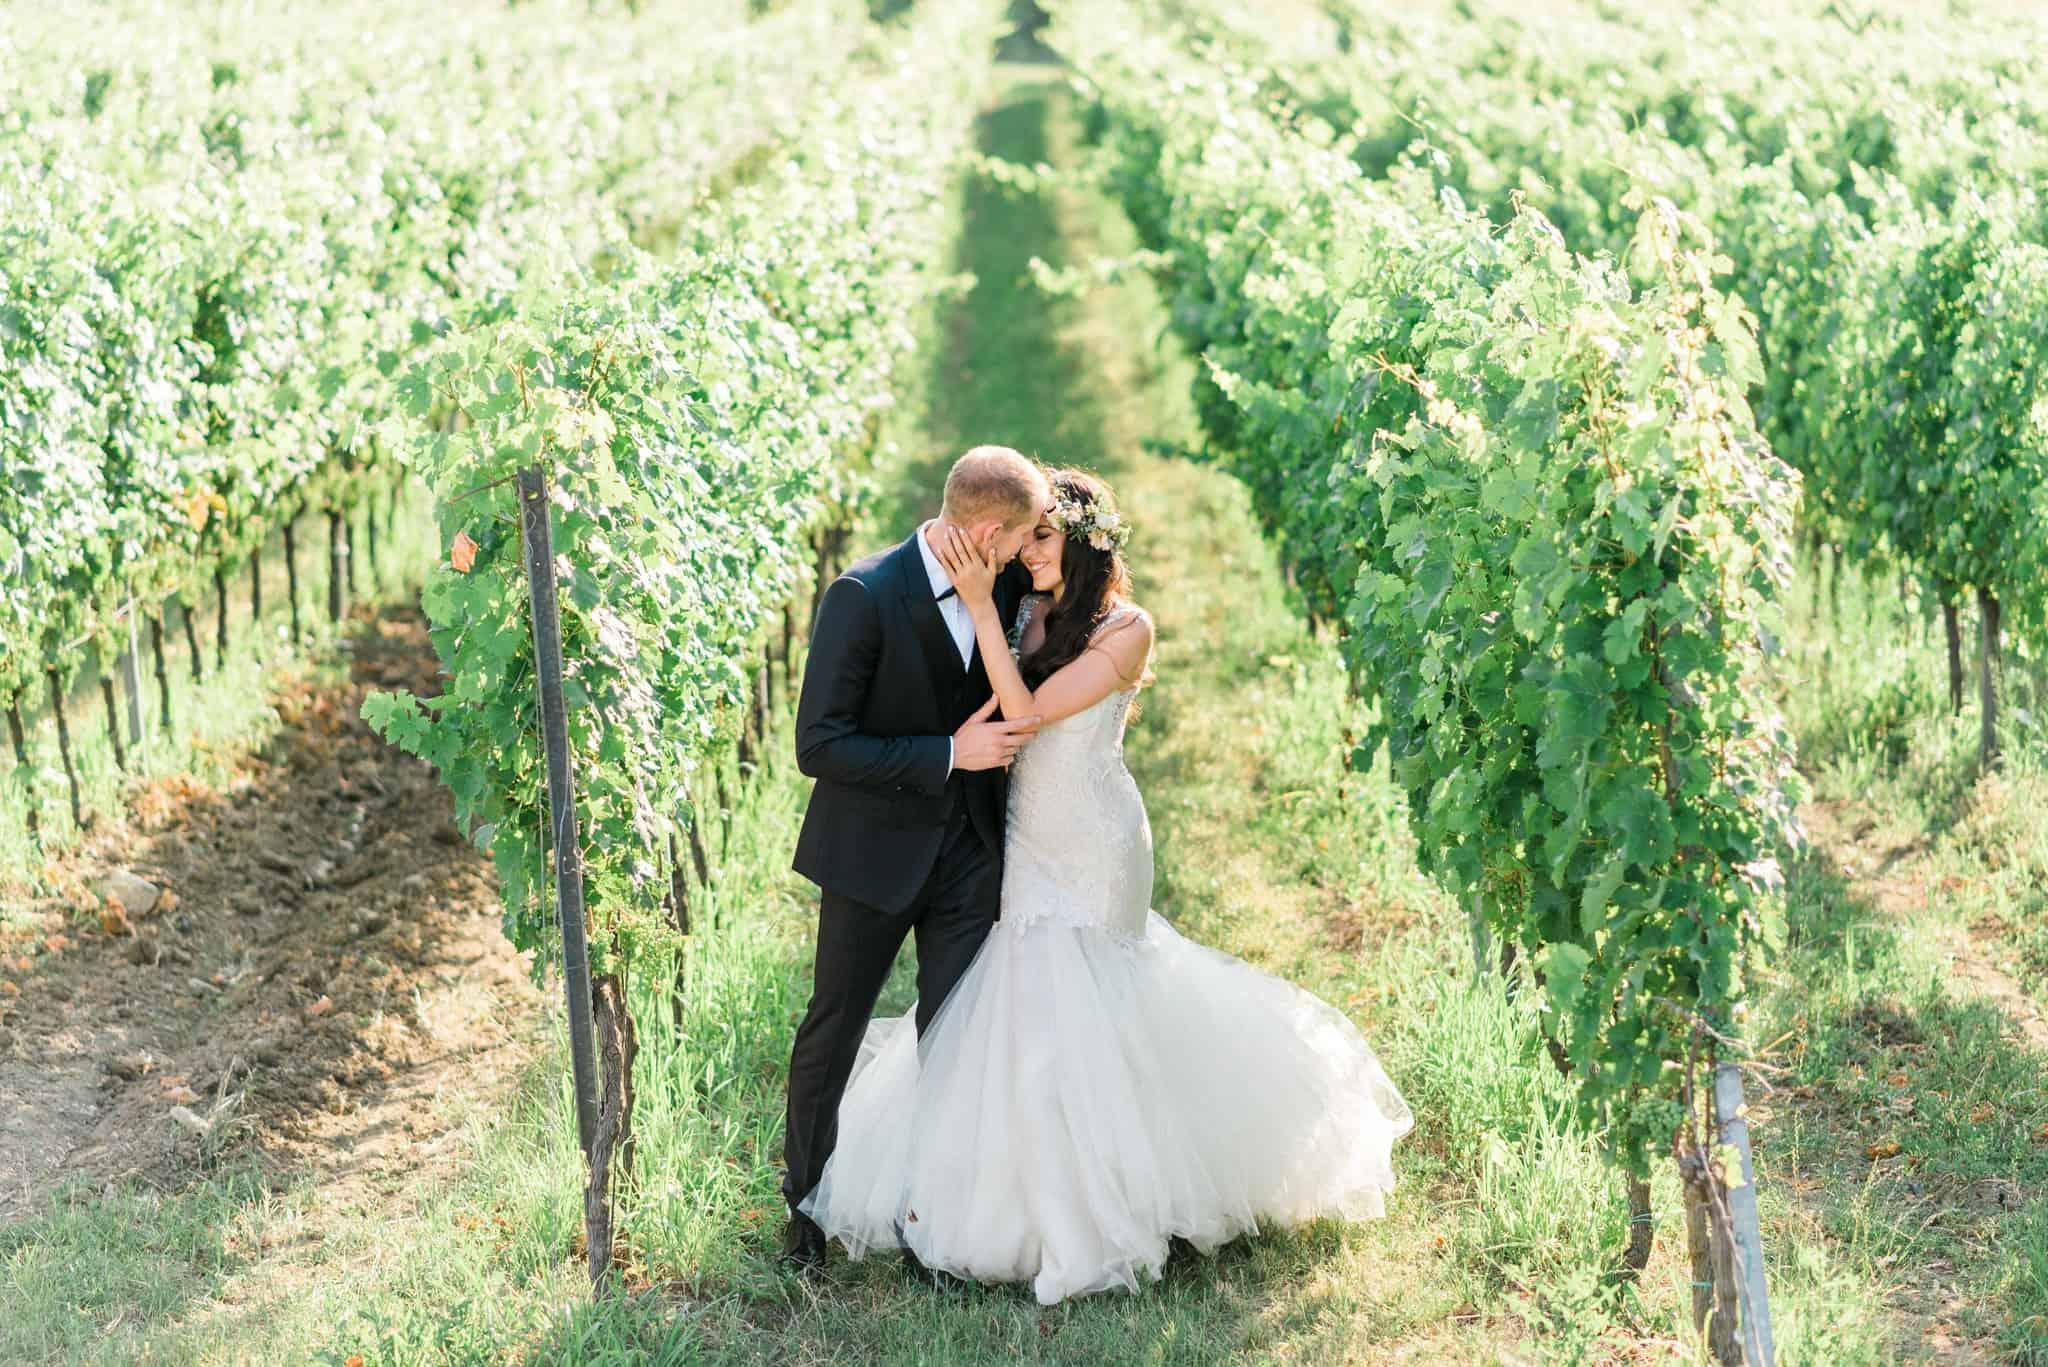 Wedoverhills_Prewedding_Film_Photographer_Vineyard_Wedding_0023